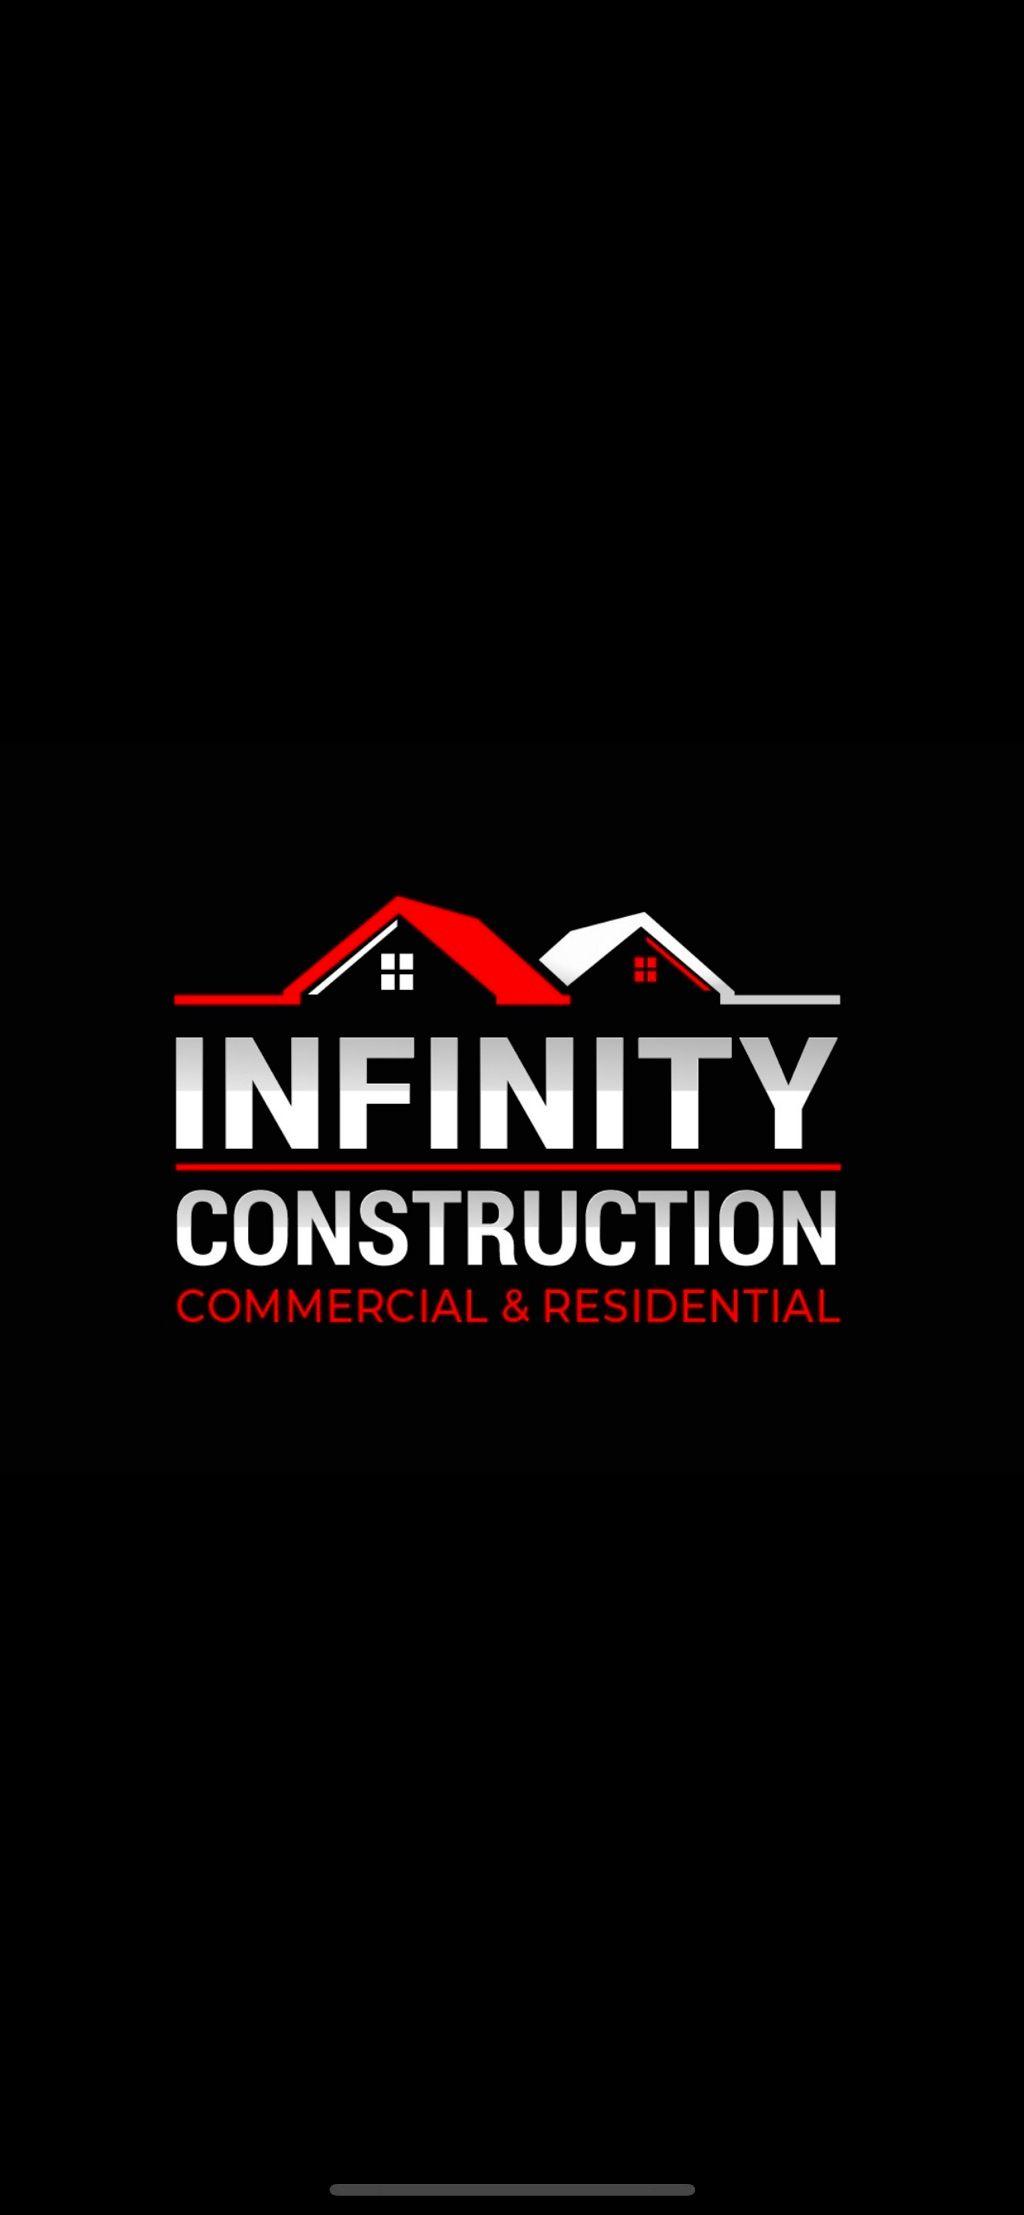 Infinity Construction